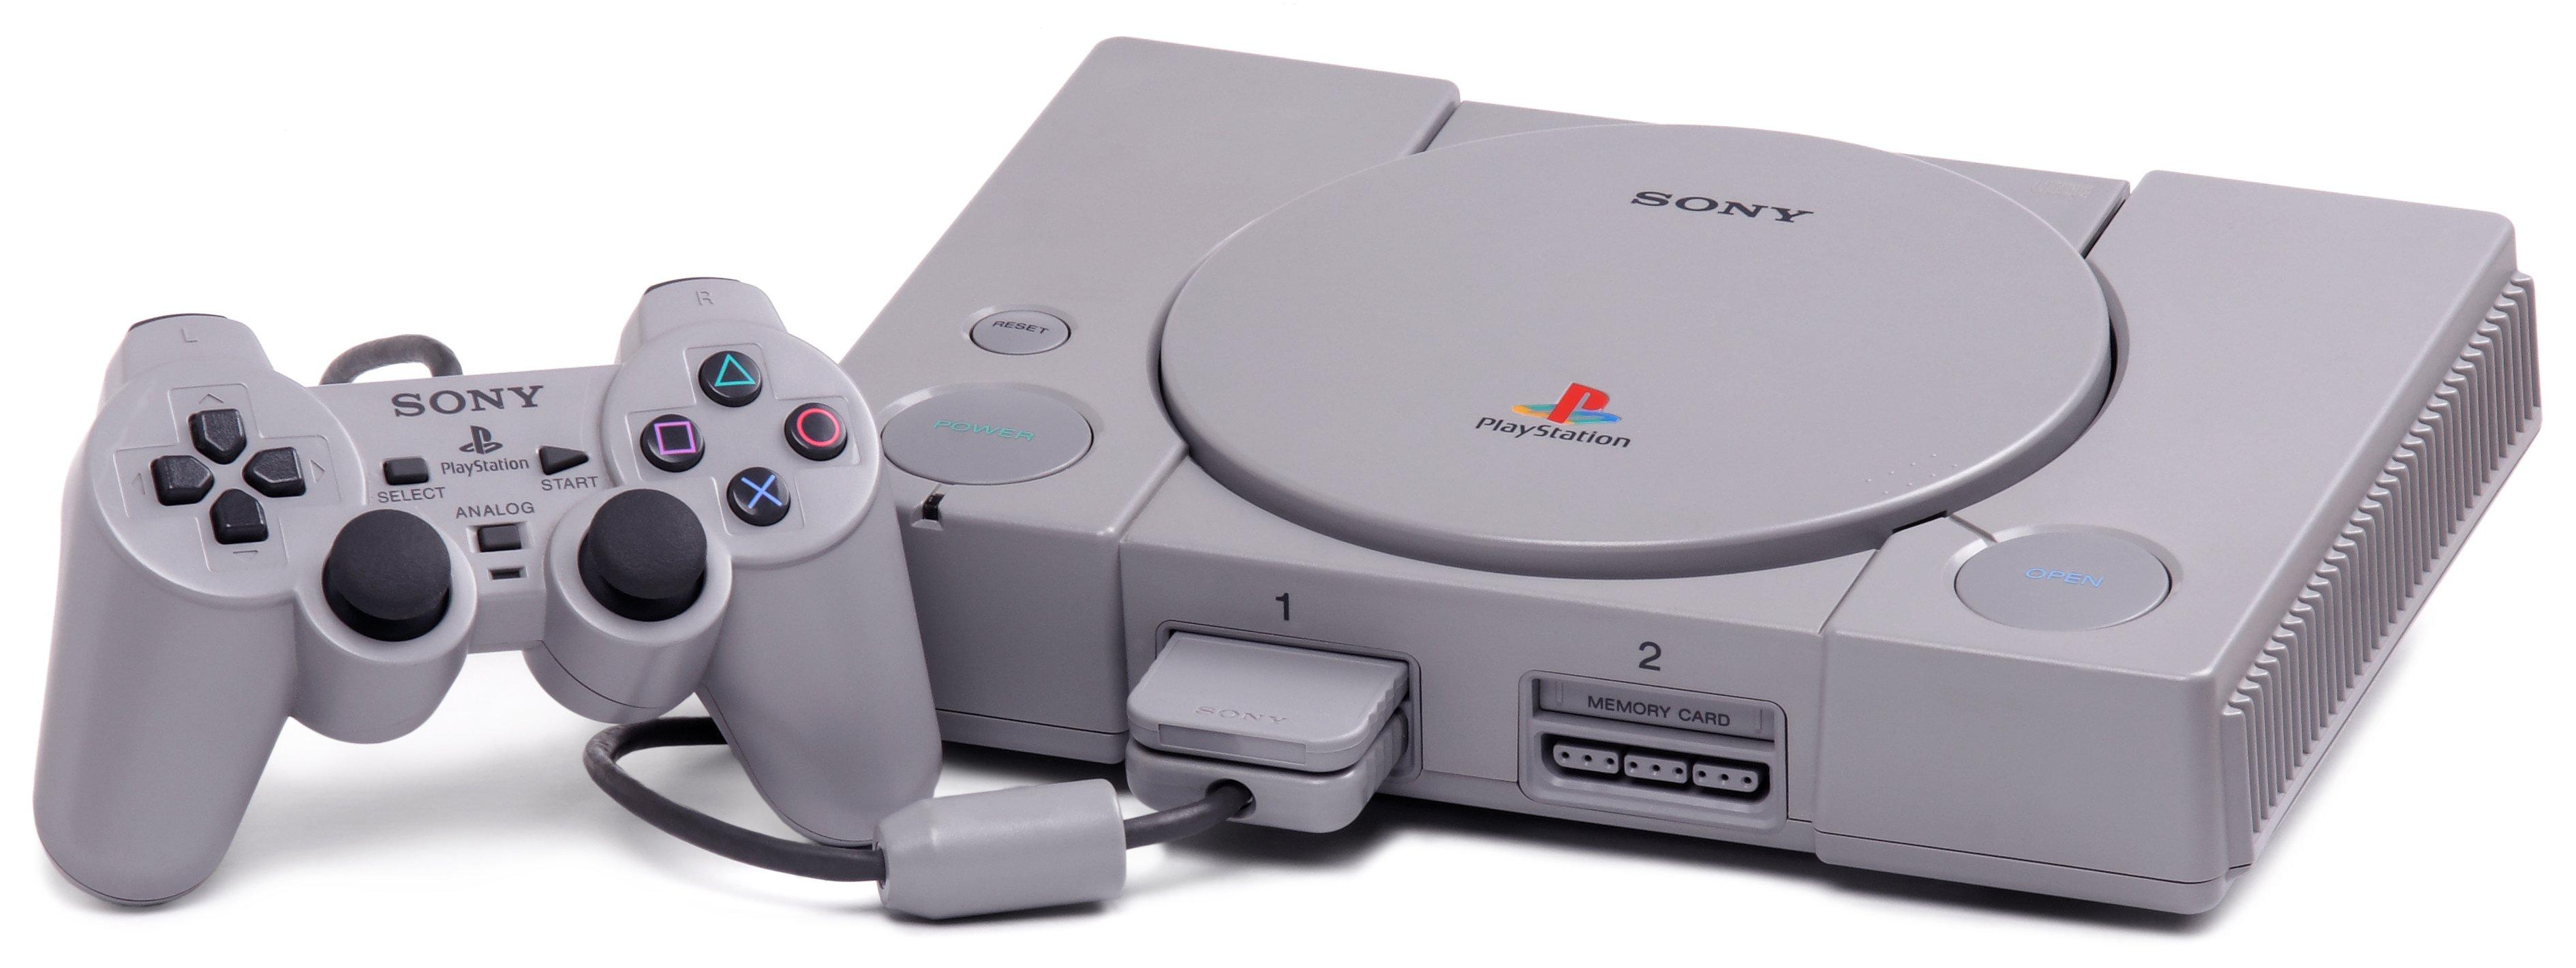 Sony_PlayStation_original